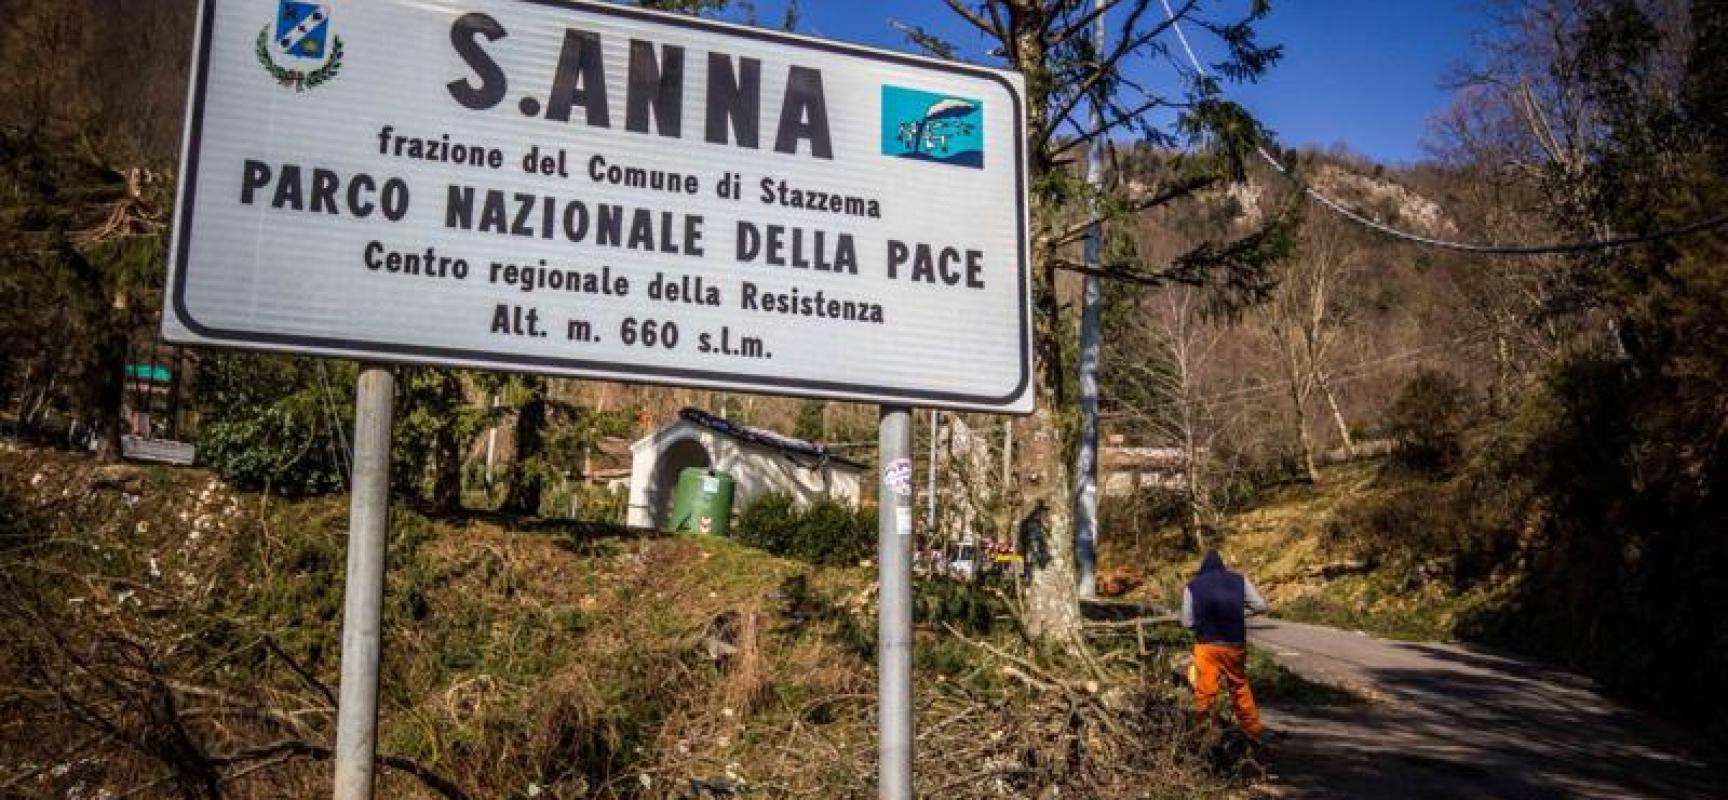 sant-anna-di-stazzema-1--1728x800_c